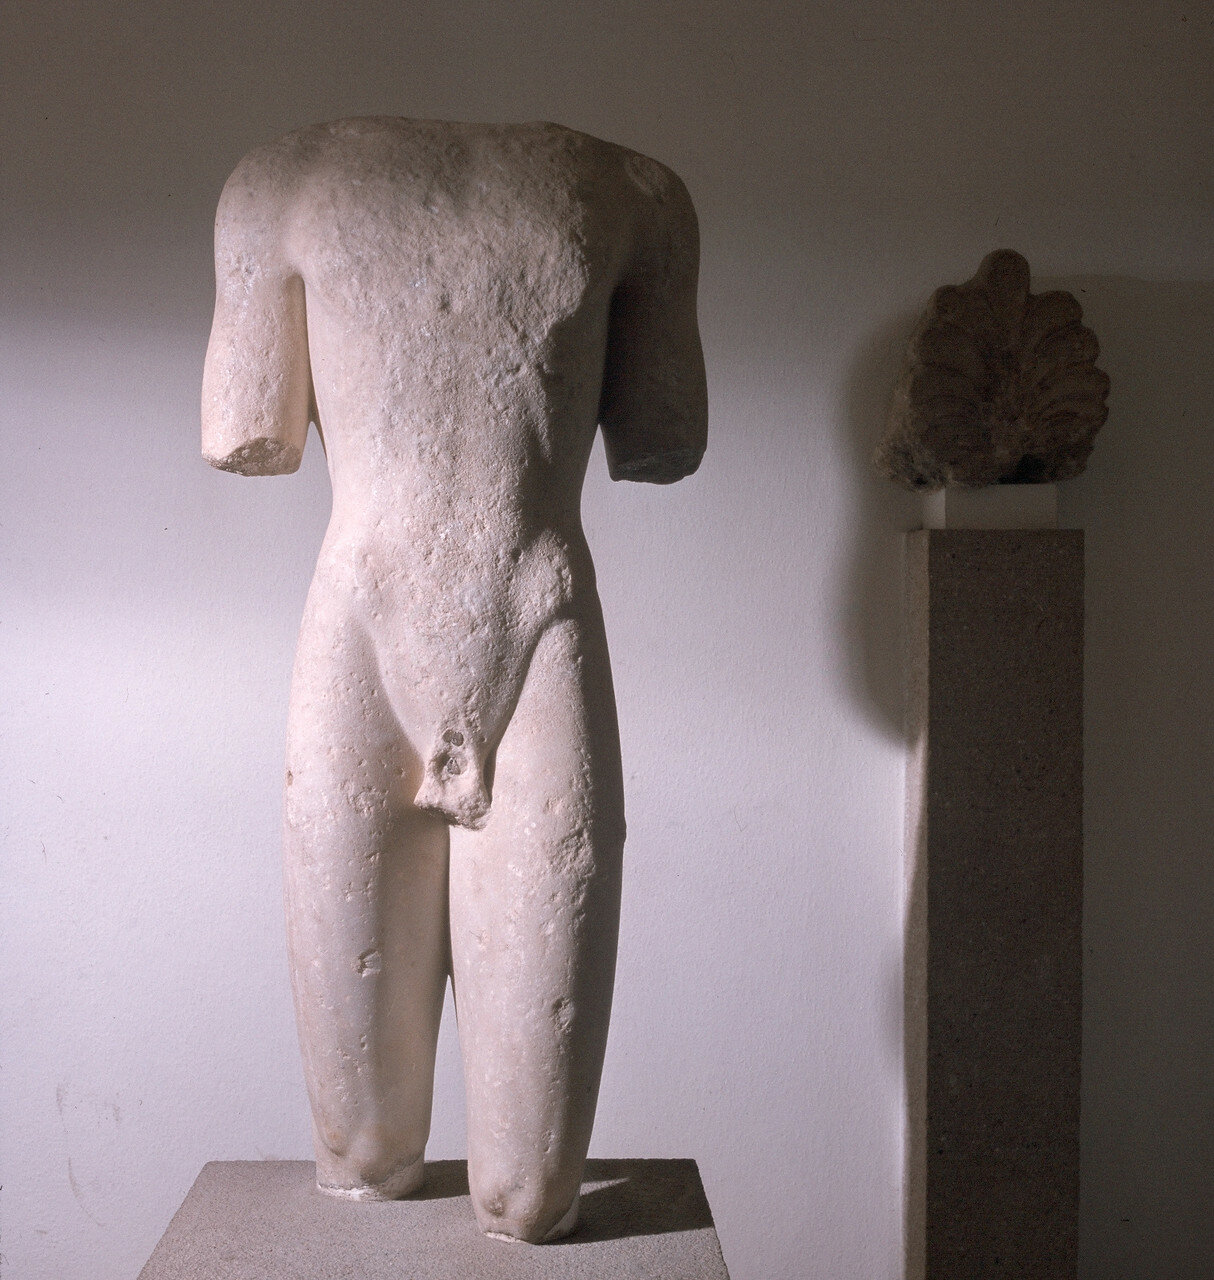 Родос. Археологический музей. Торс куроса, мрамор, 550-530 гг. до н.э. Из Камироса